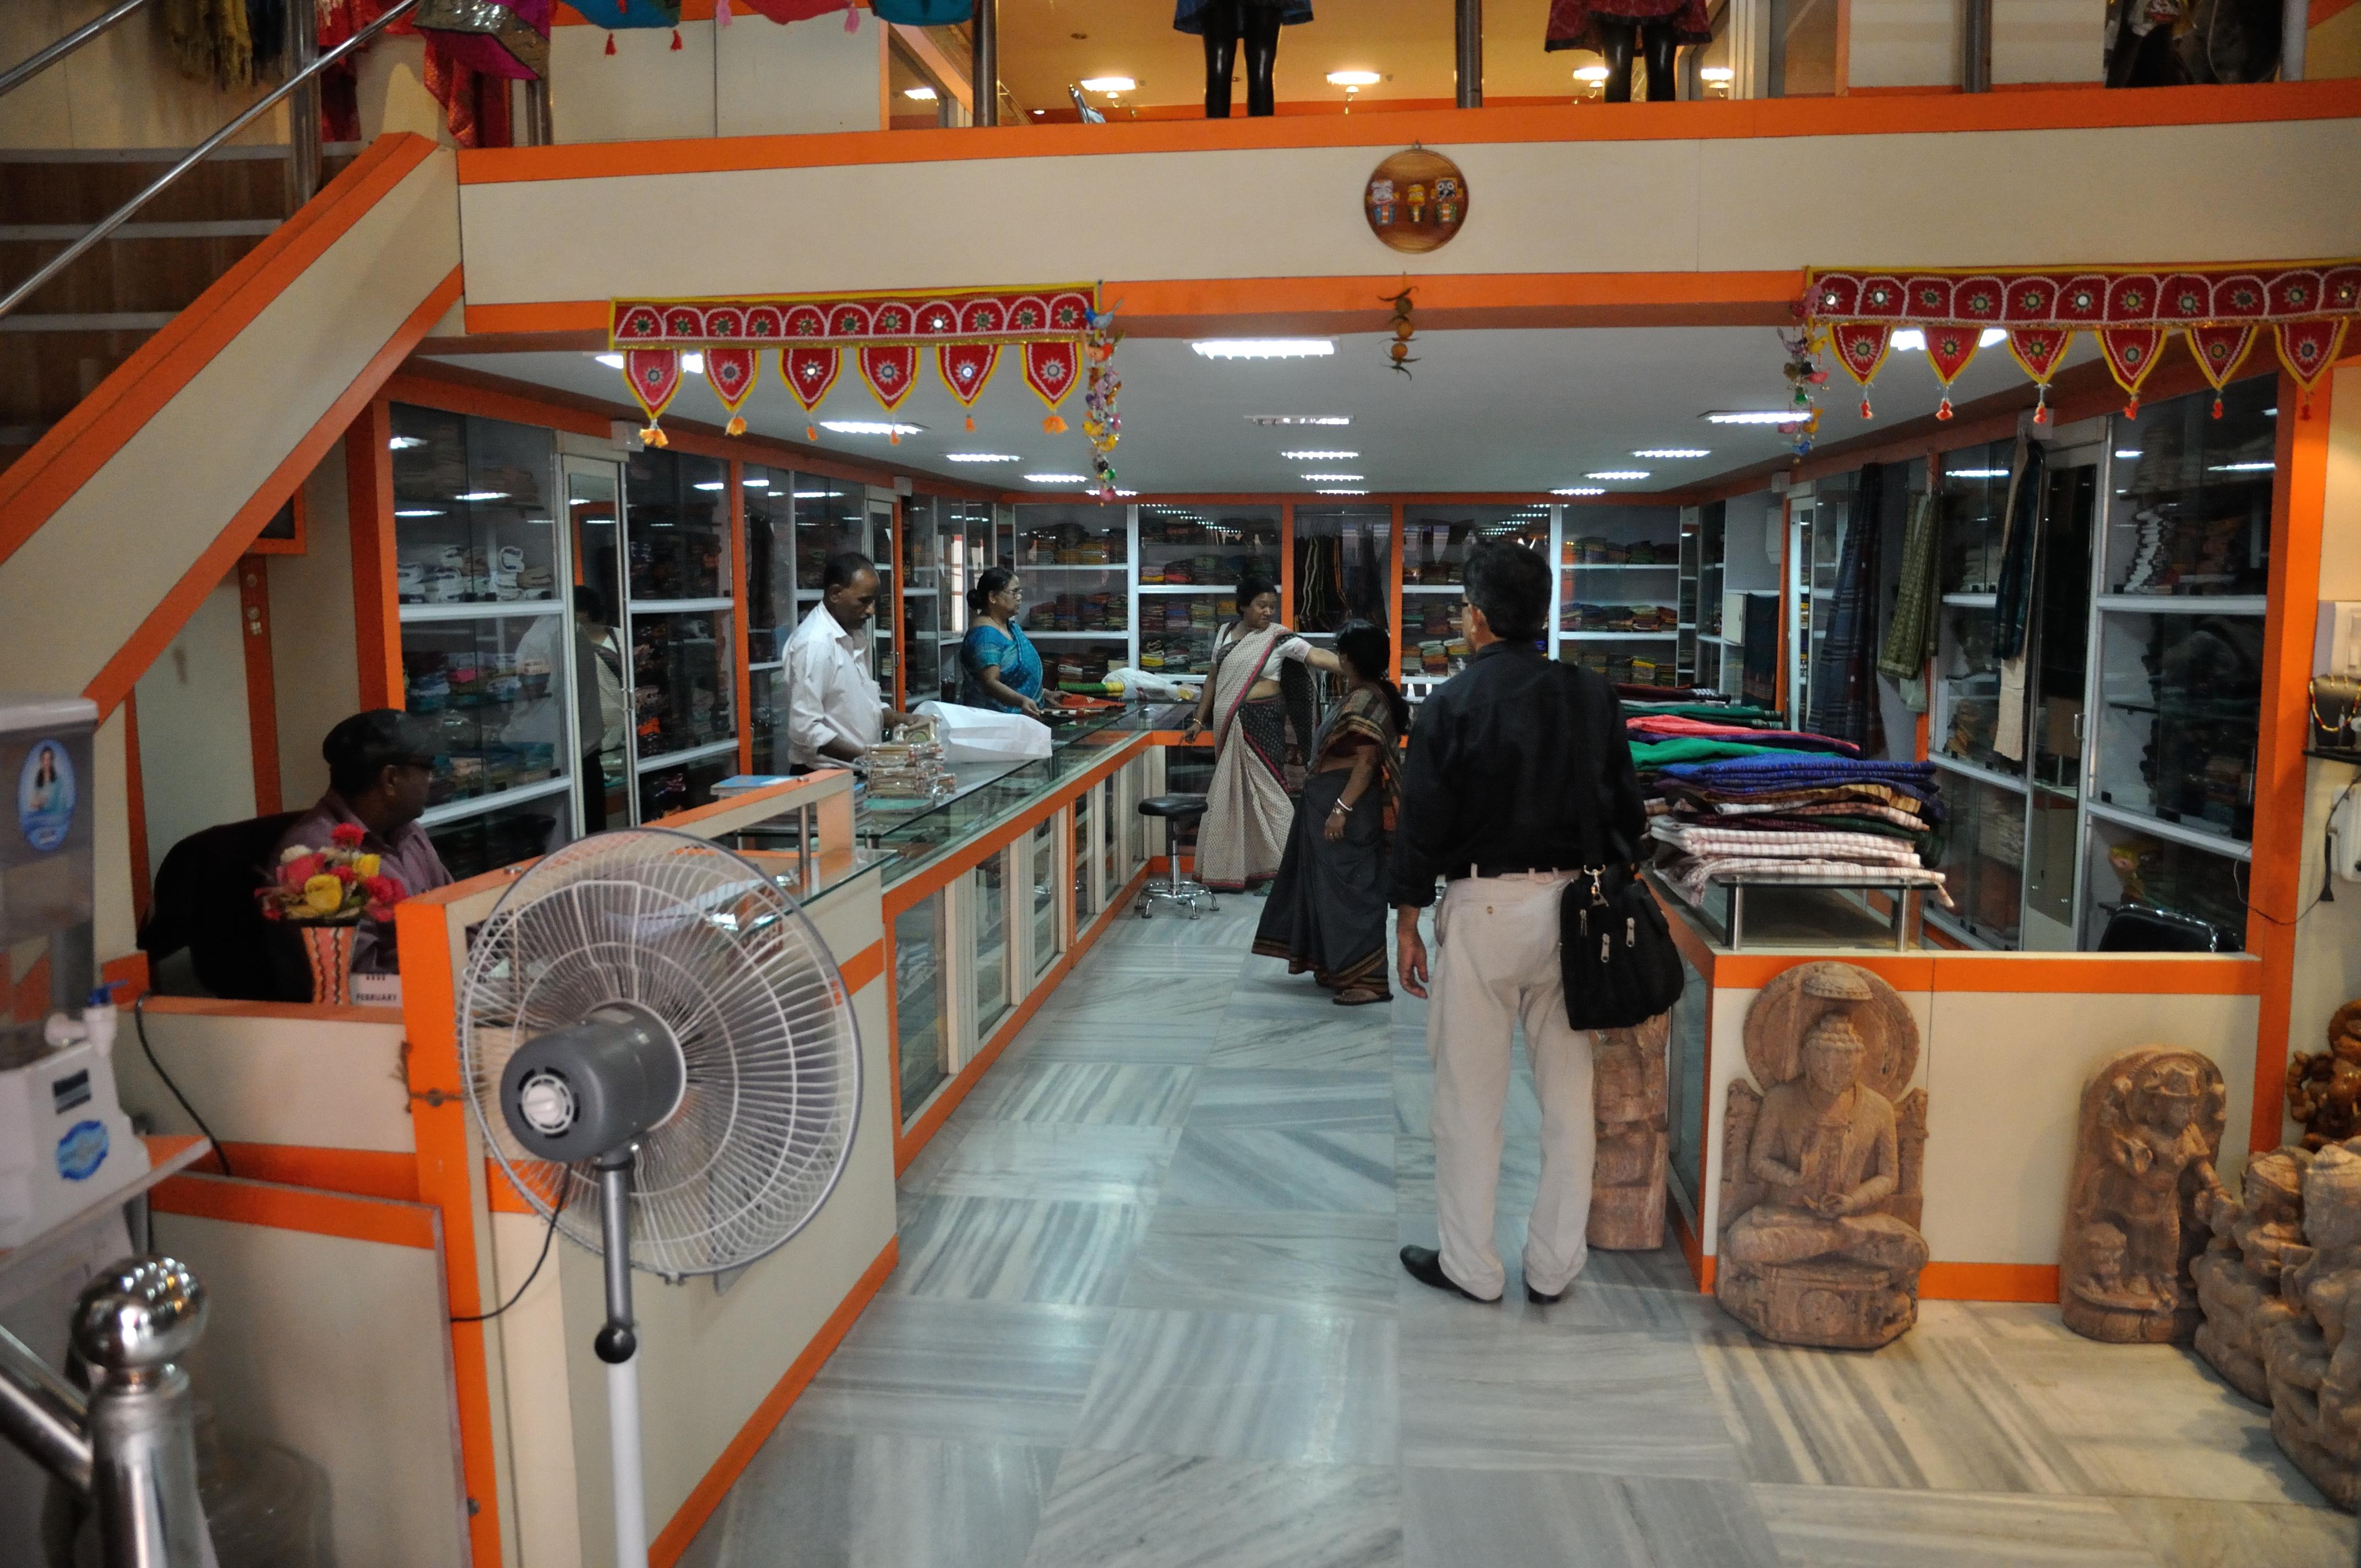 File:Utkalika - Odisha State Emporium - Dakshinapan - Market Complex -  Dhakuria - Kolkata 2014-02-12 2016.JPG - Wikimedia Commons